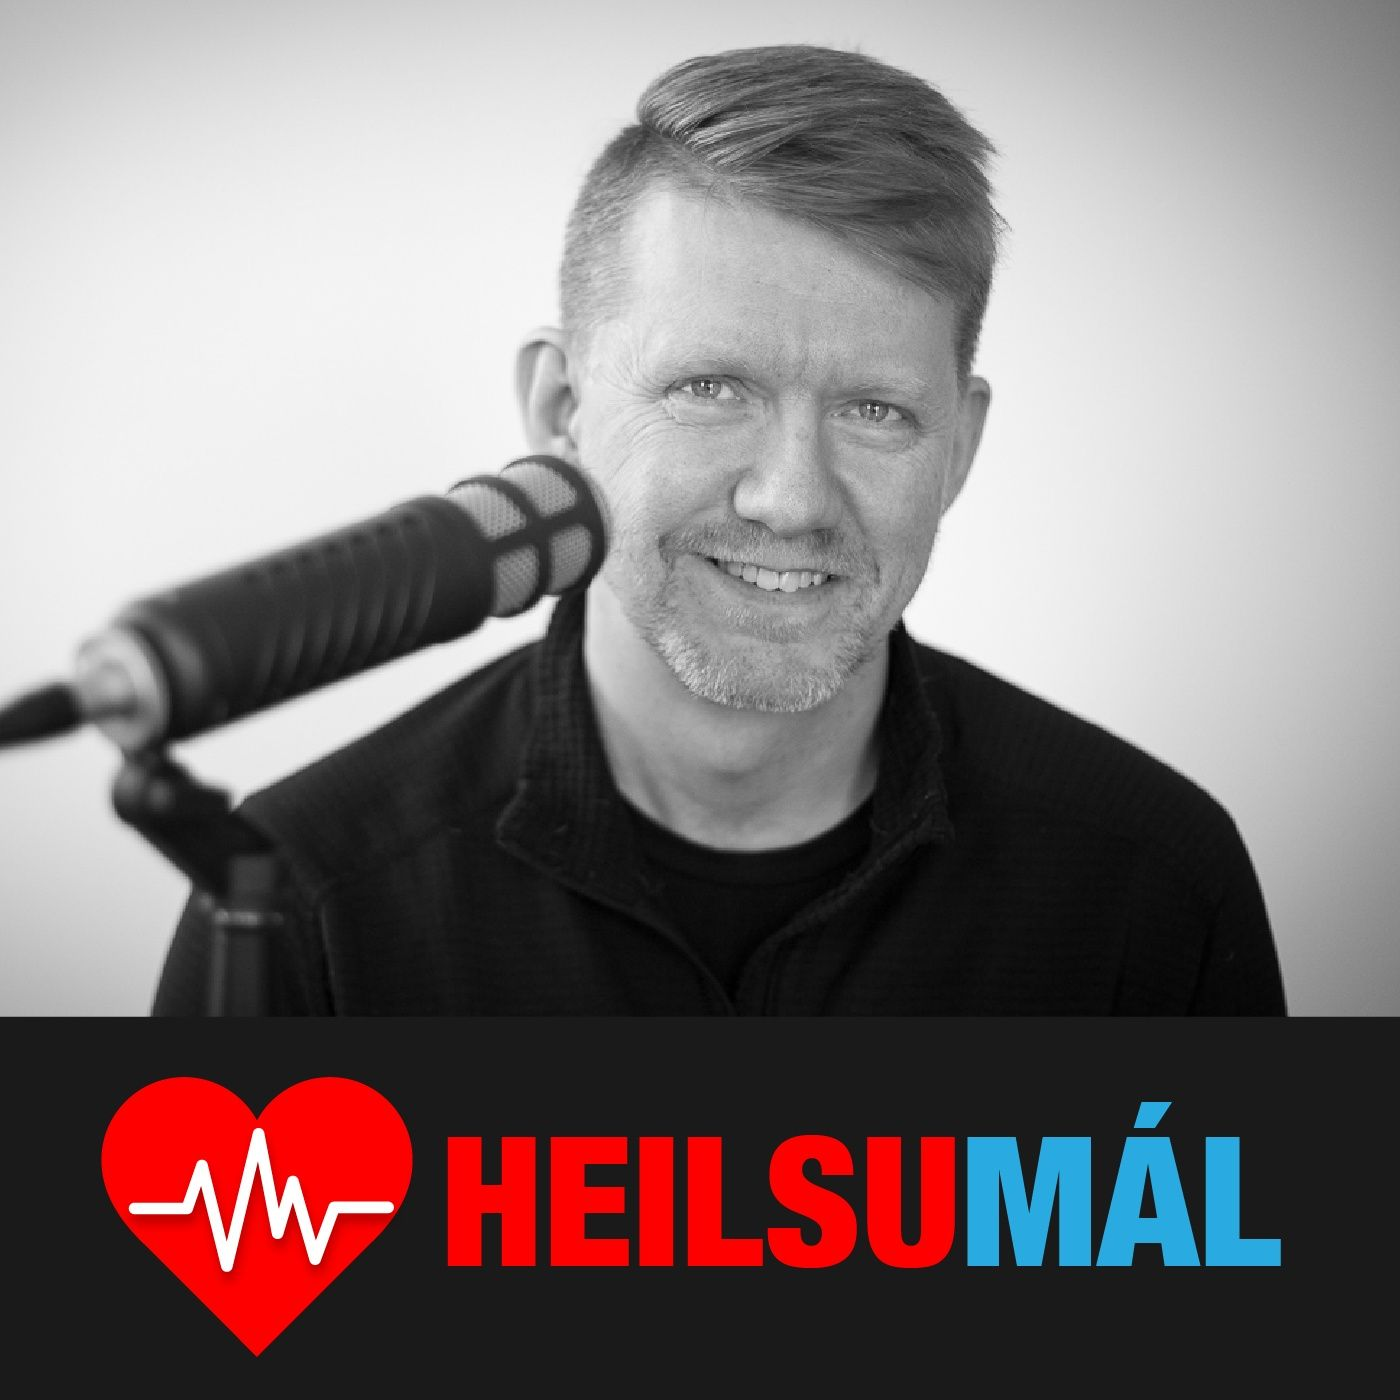 Heilsumál 08 - Betri sjón og betri augnheilsa - Jóhannes Kári